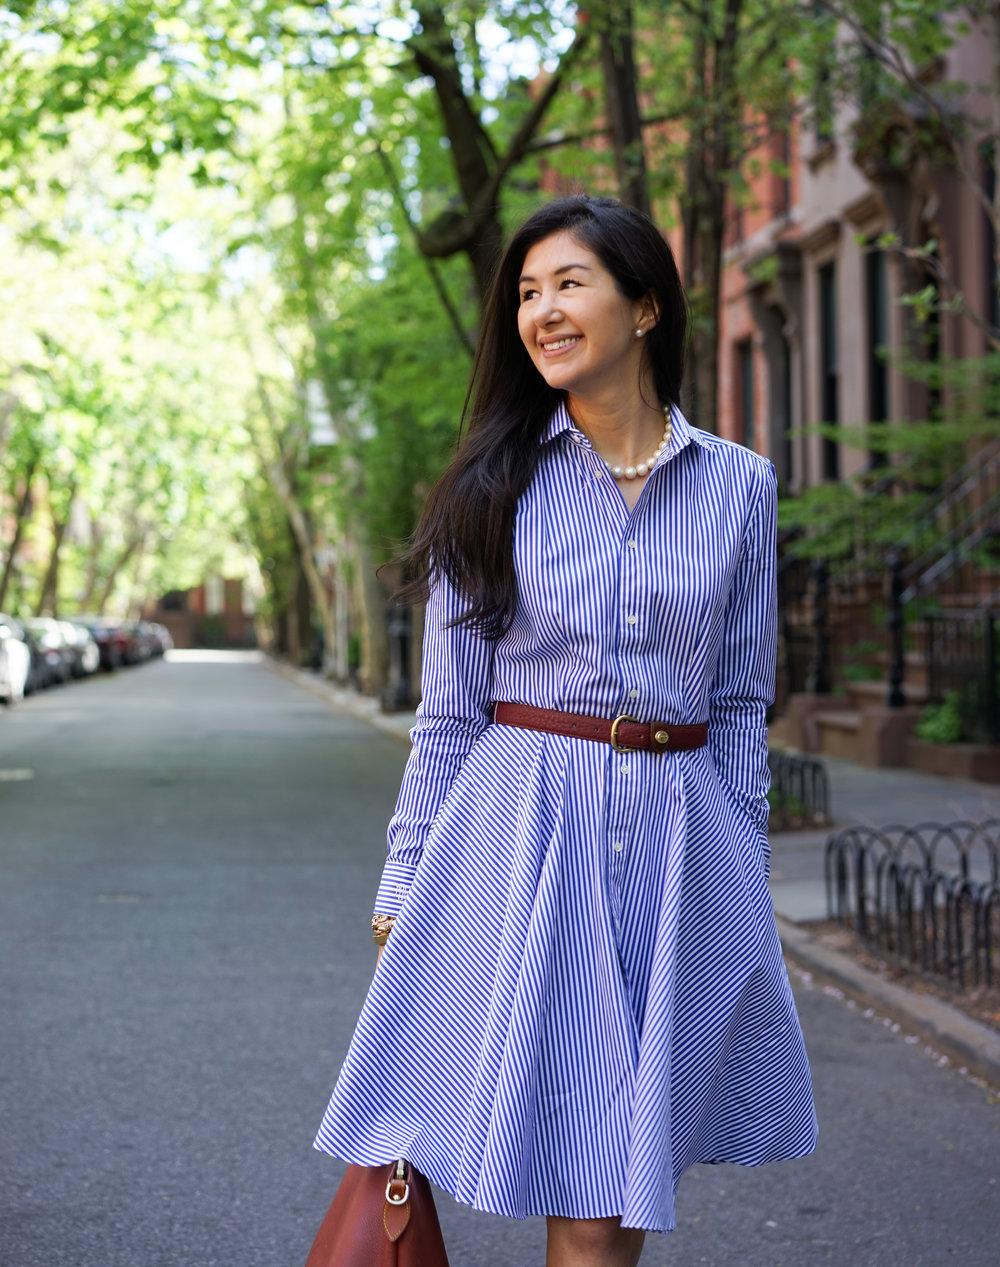 Ralph_Lauren_Shirtdress_New York_NYC.jpg